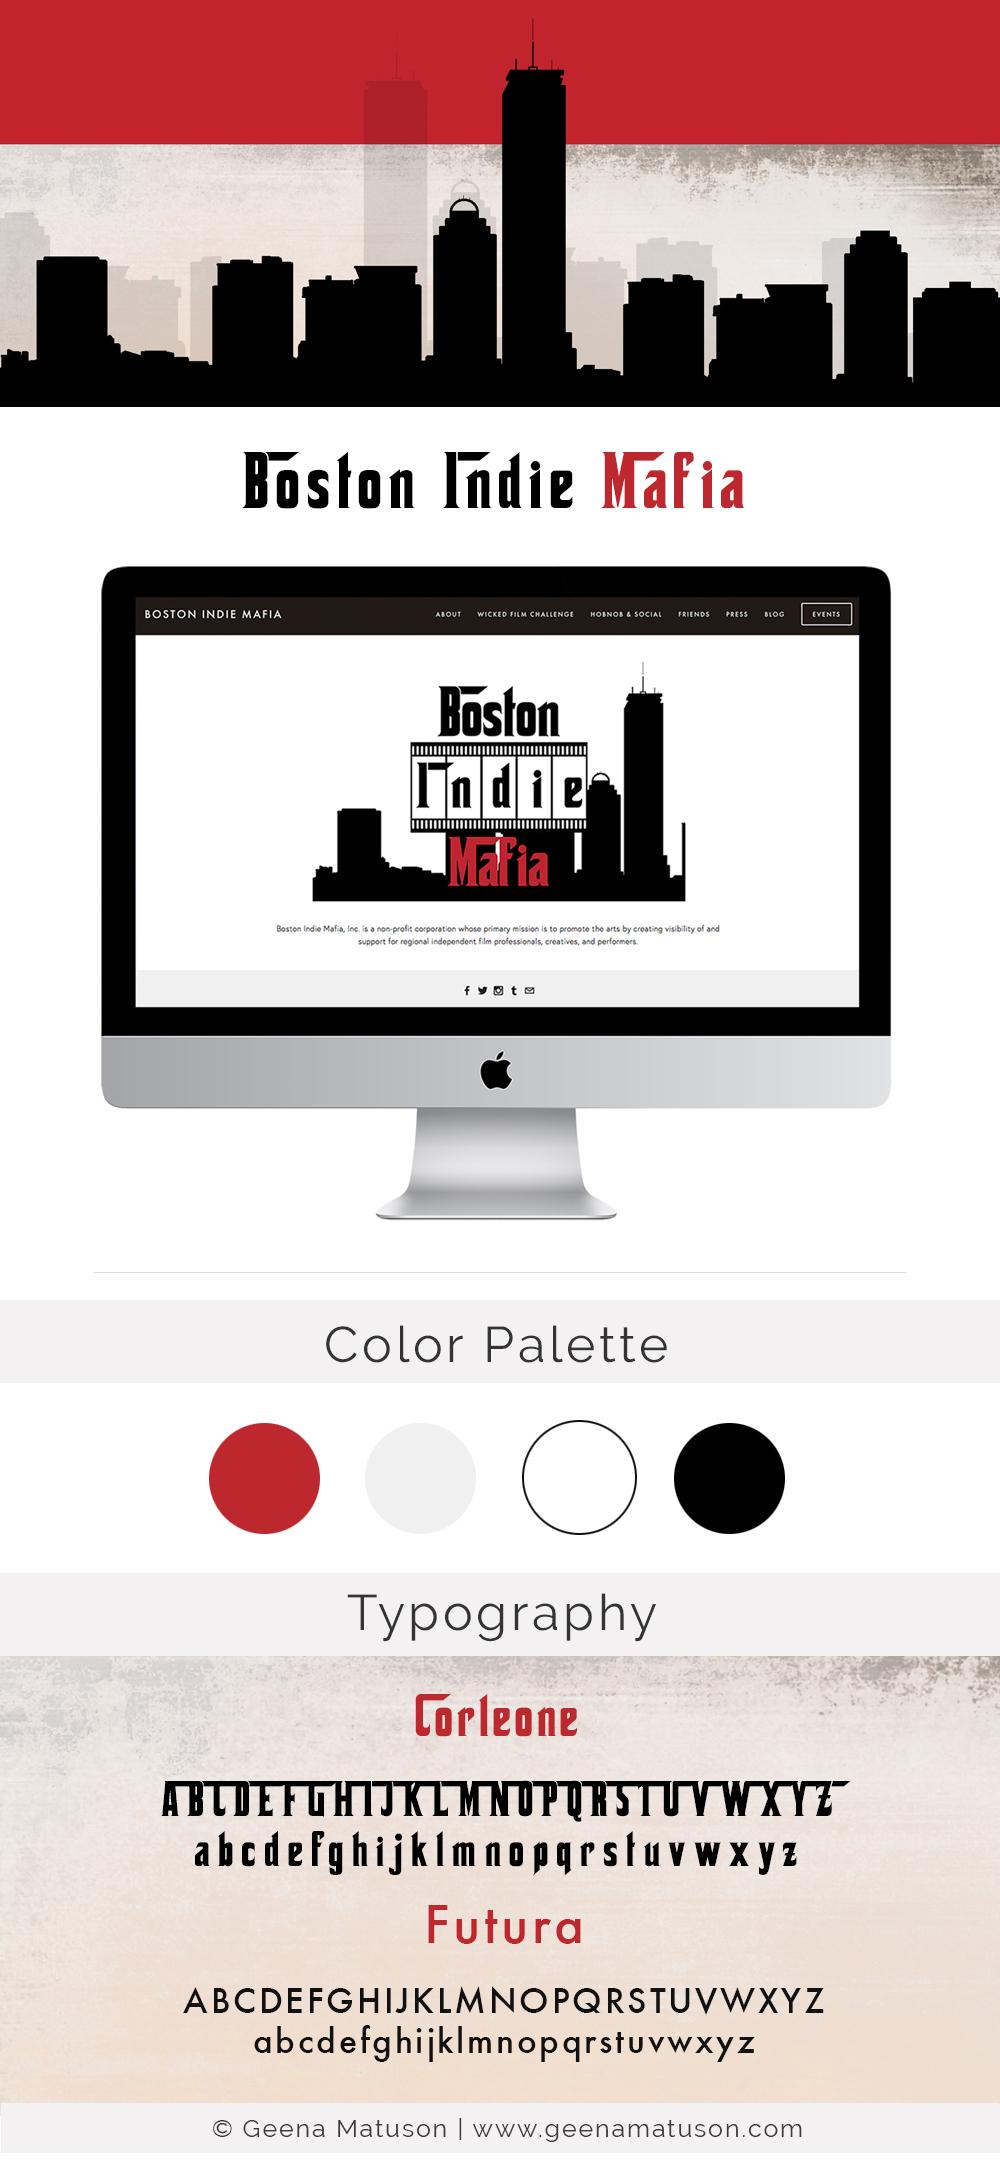 GeenaMatuson_Design_Elements_BostonIndieMafia.jpg